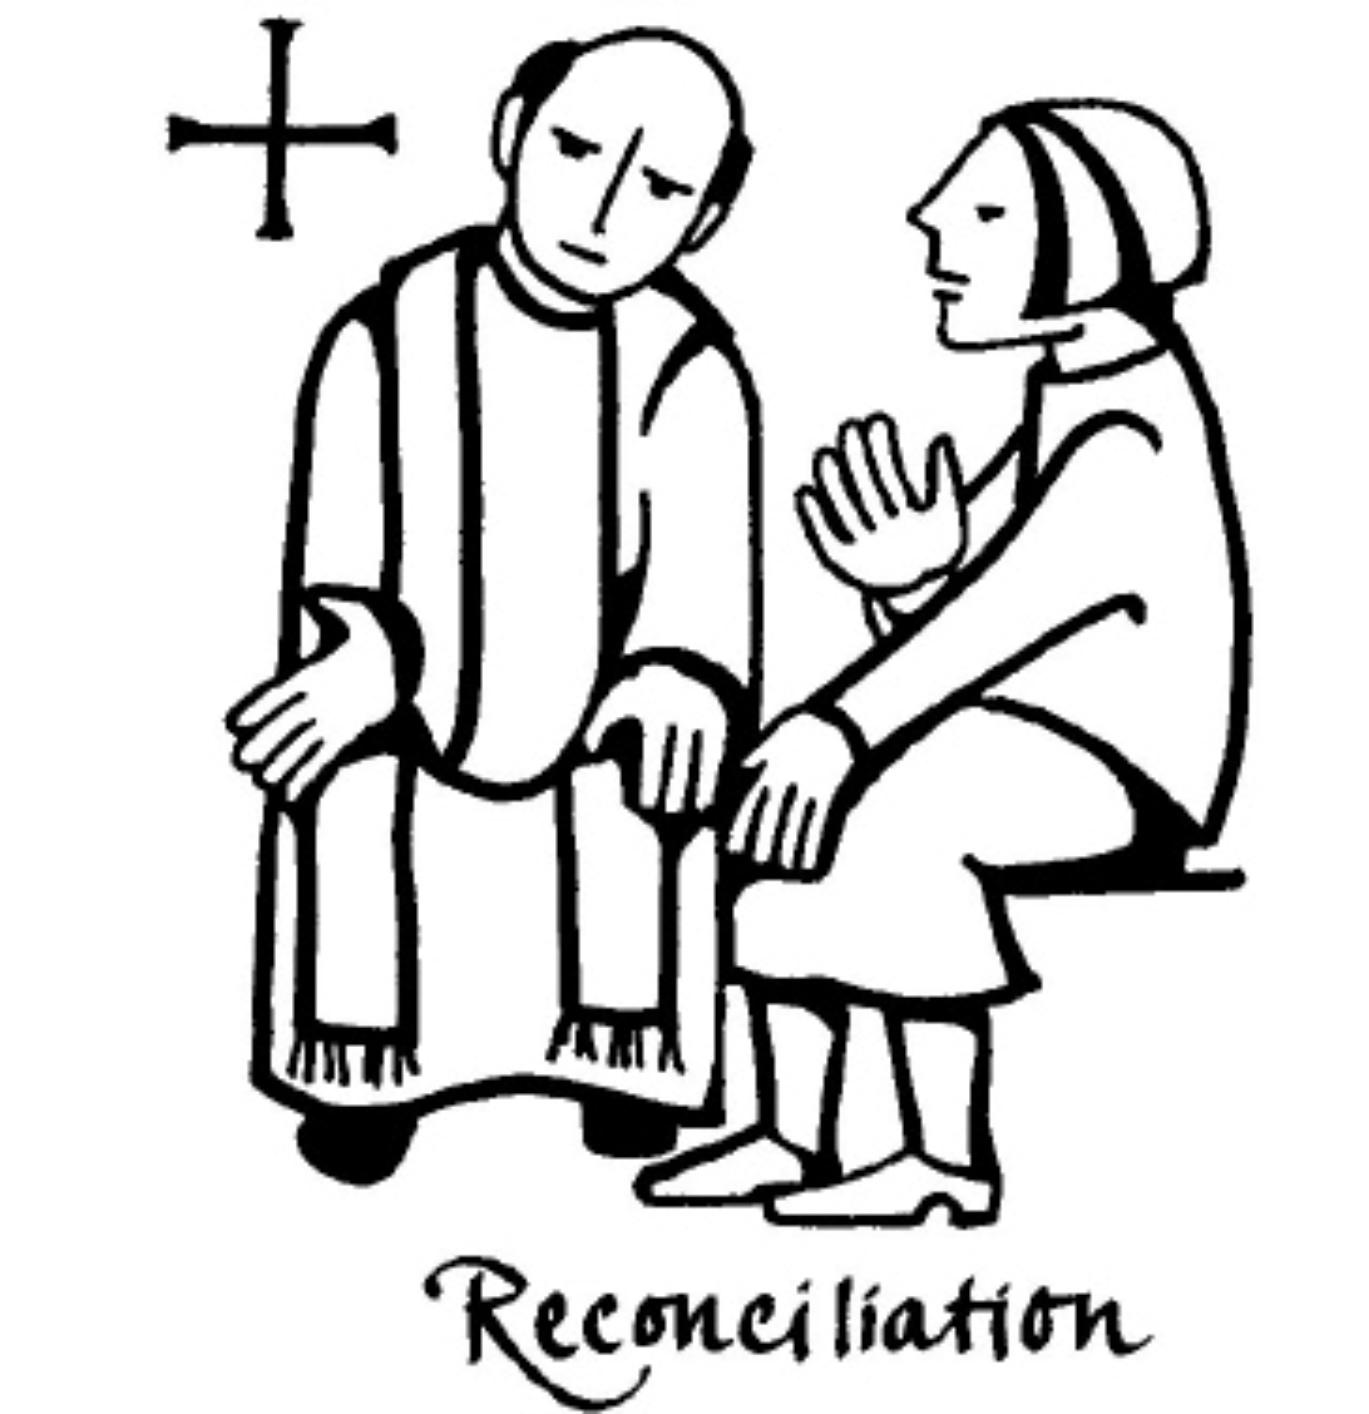 PlusPng pluspng.com reconciliation.jpg PlusPng pluspng.com - Reconciliation PNG HD . - Lent PNG HD Free